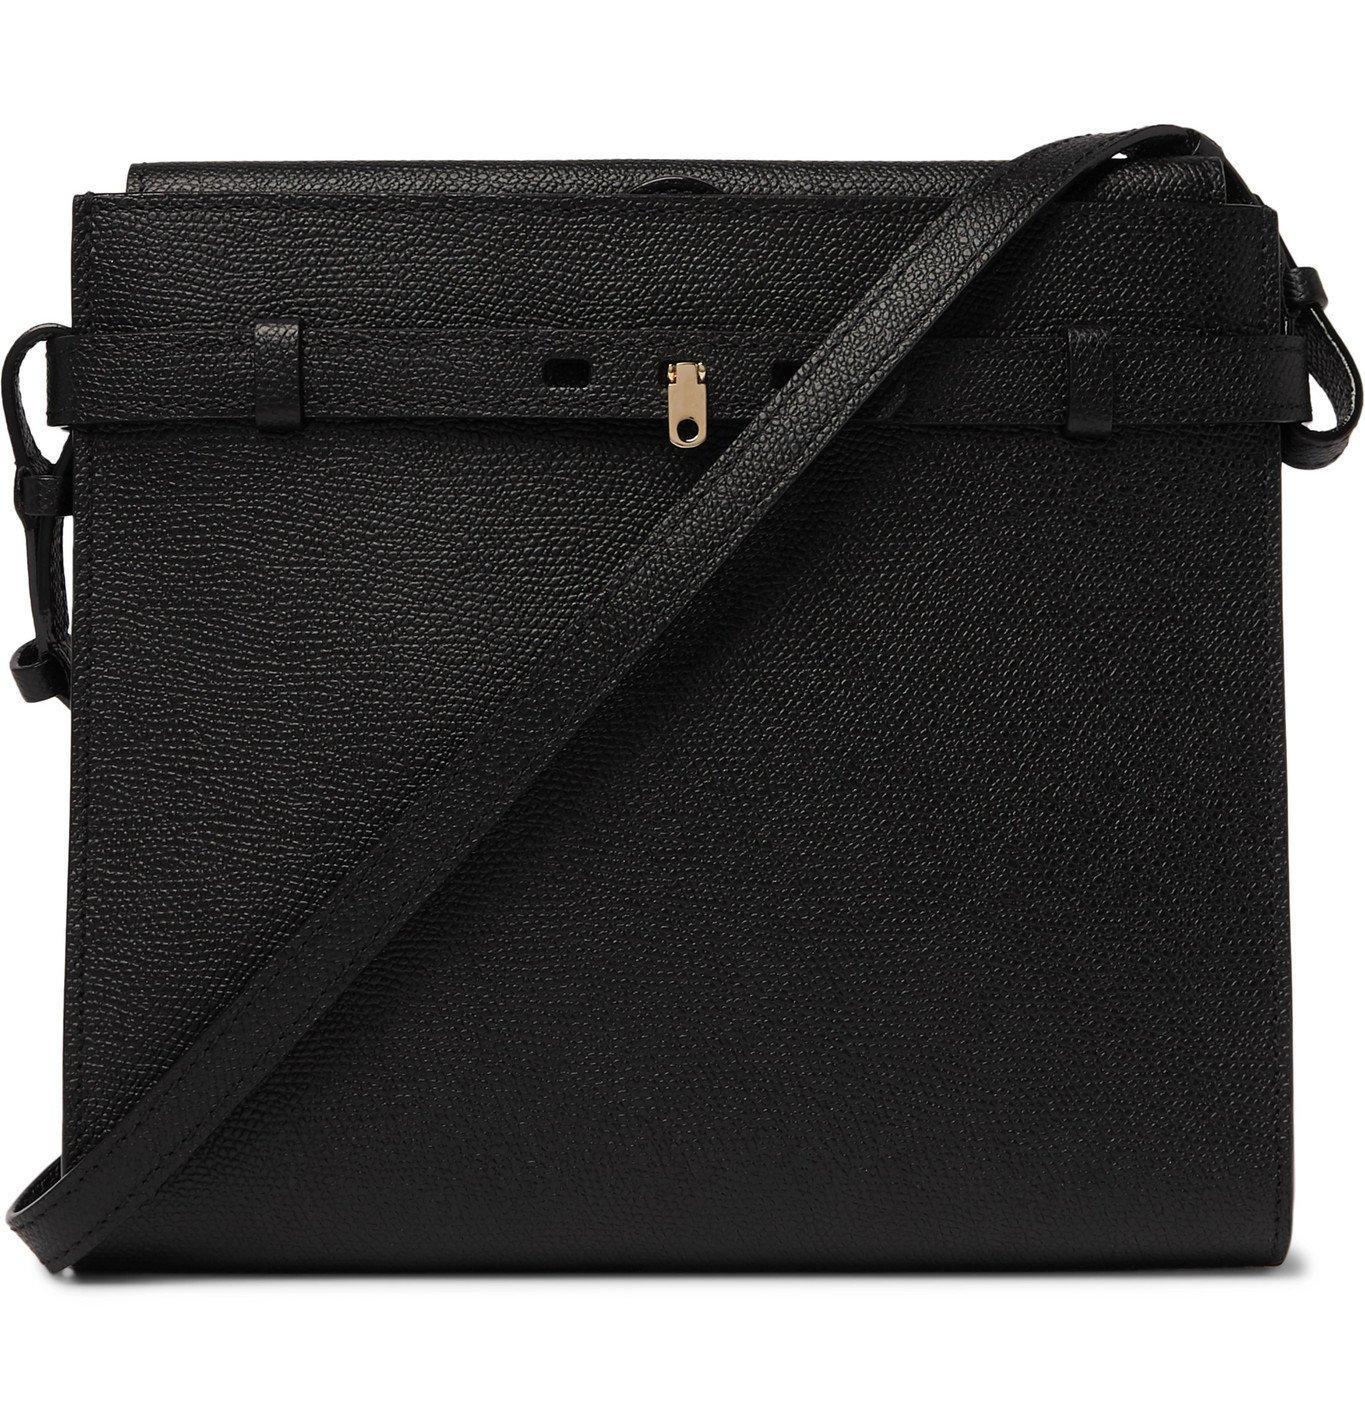 Photo: Valextra - Brera B-Tracollina Pebble-Grain Leather Messenger Bag - Black